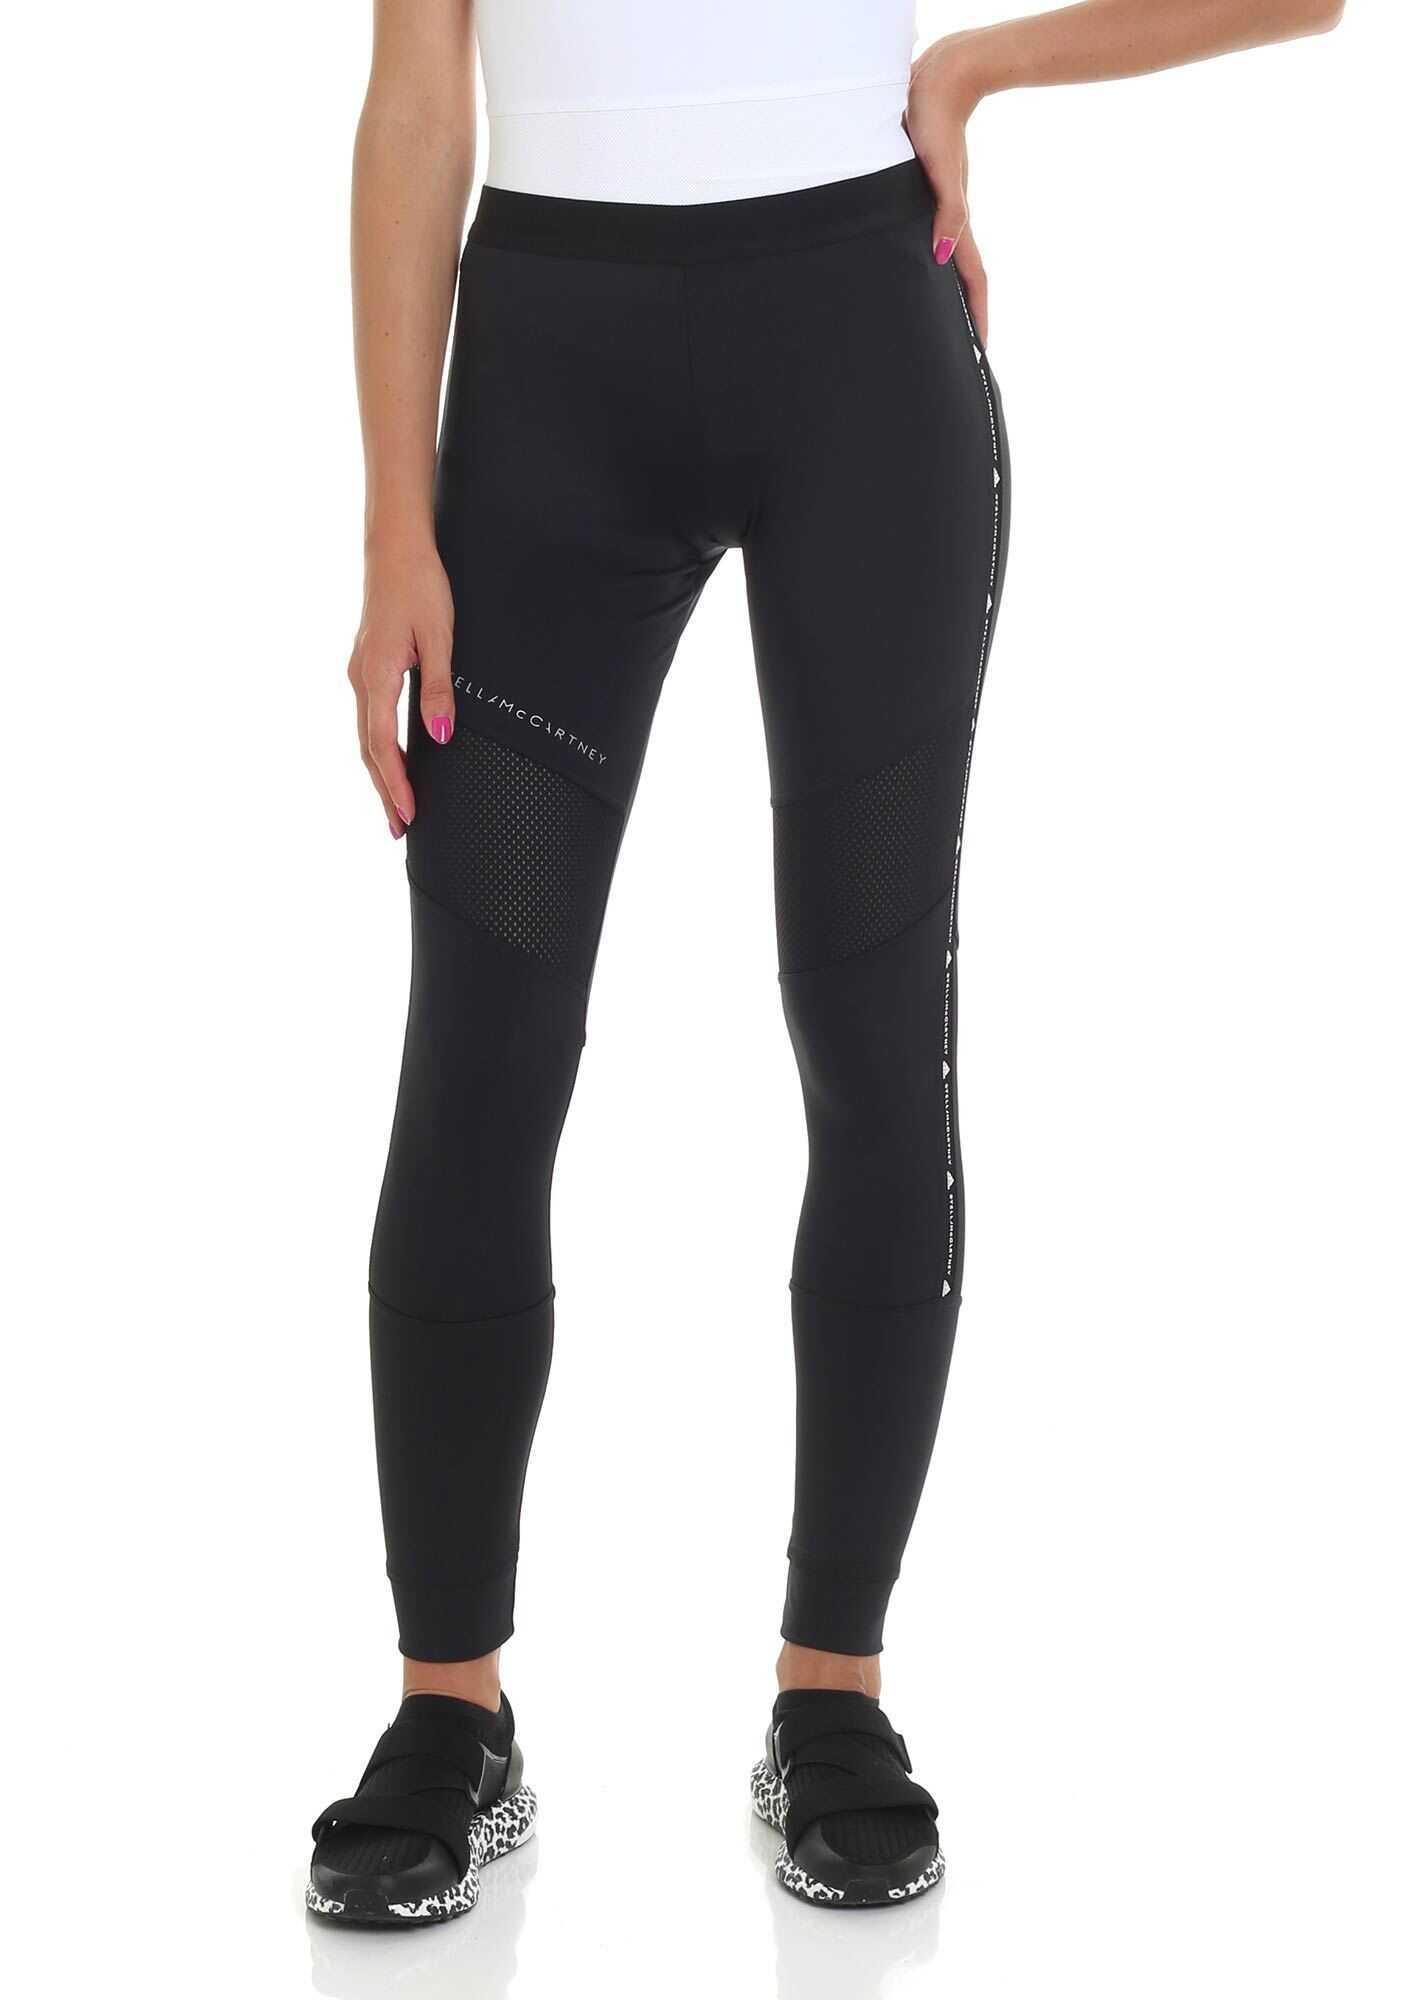 adidas by Stella McCartney Black Performance Essentials Leggings Black